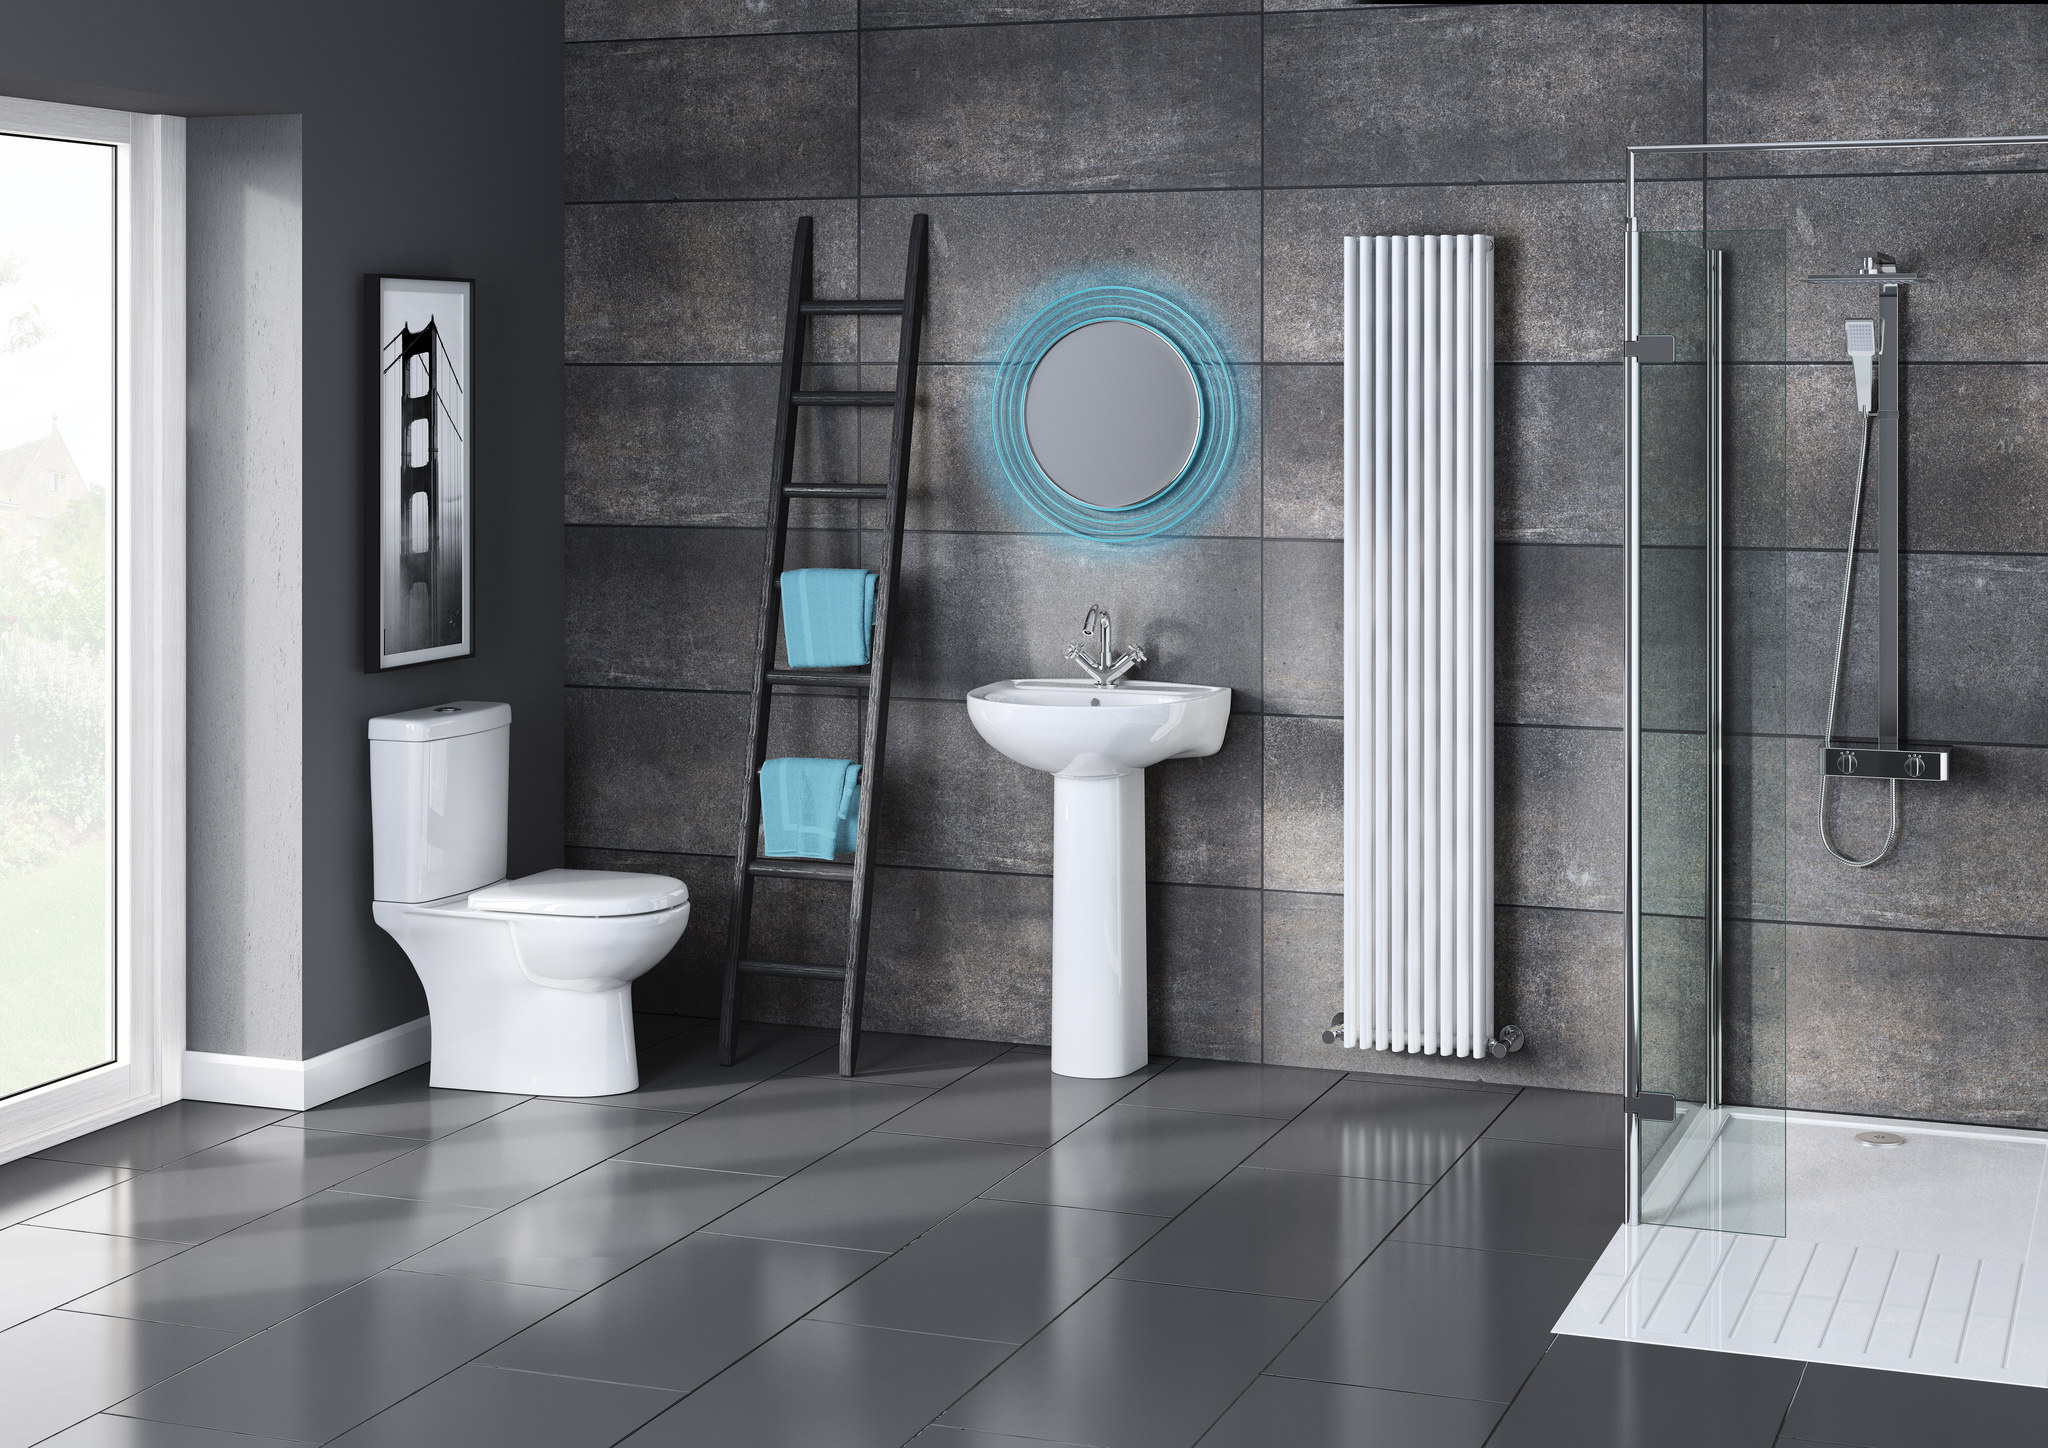 lizzie benton vannaja v stile modern 2 - Идеи для ремонта туалета своими руками